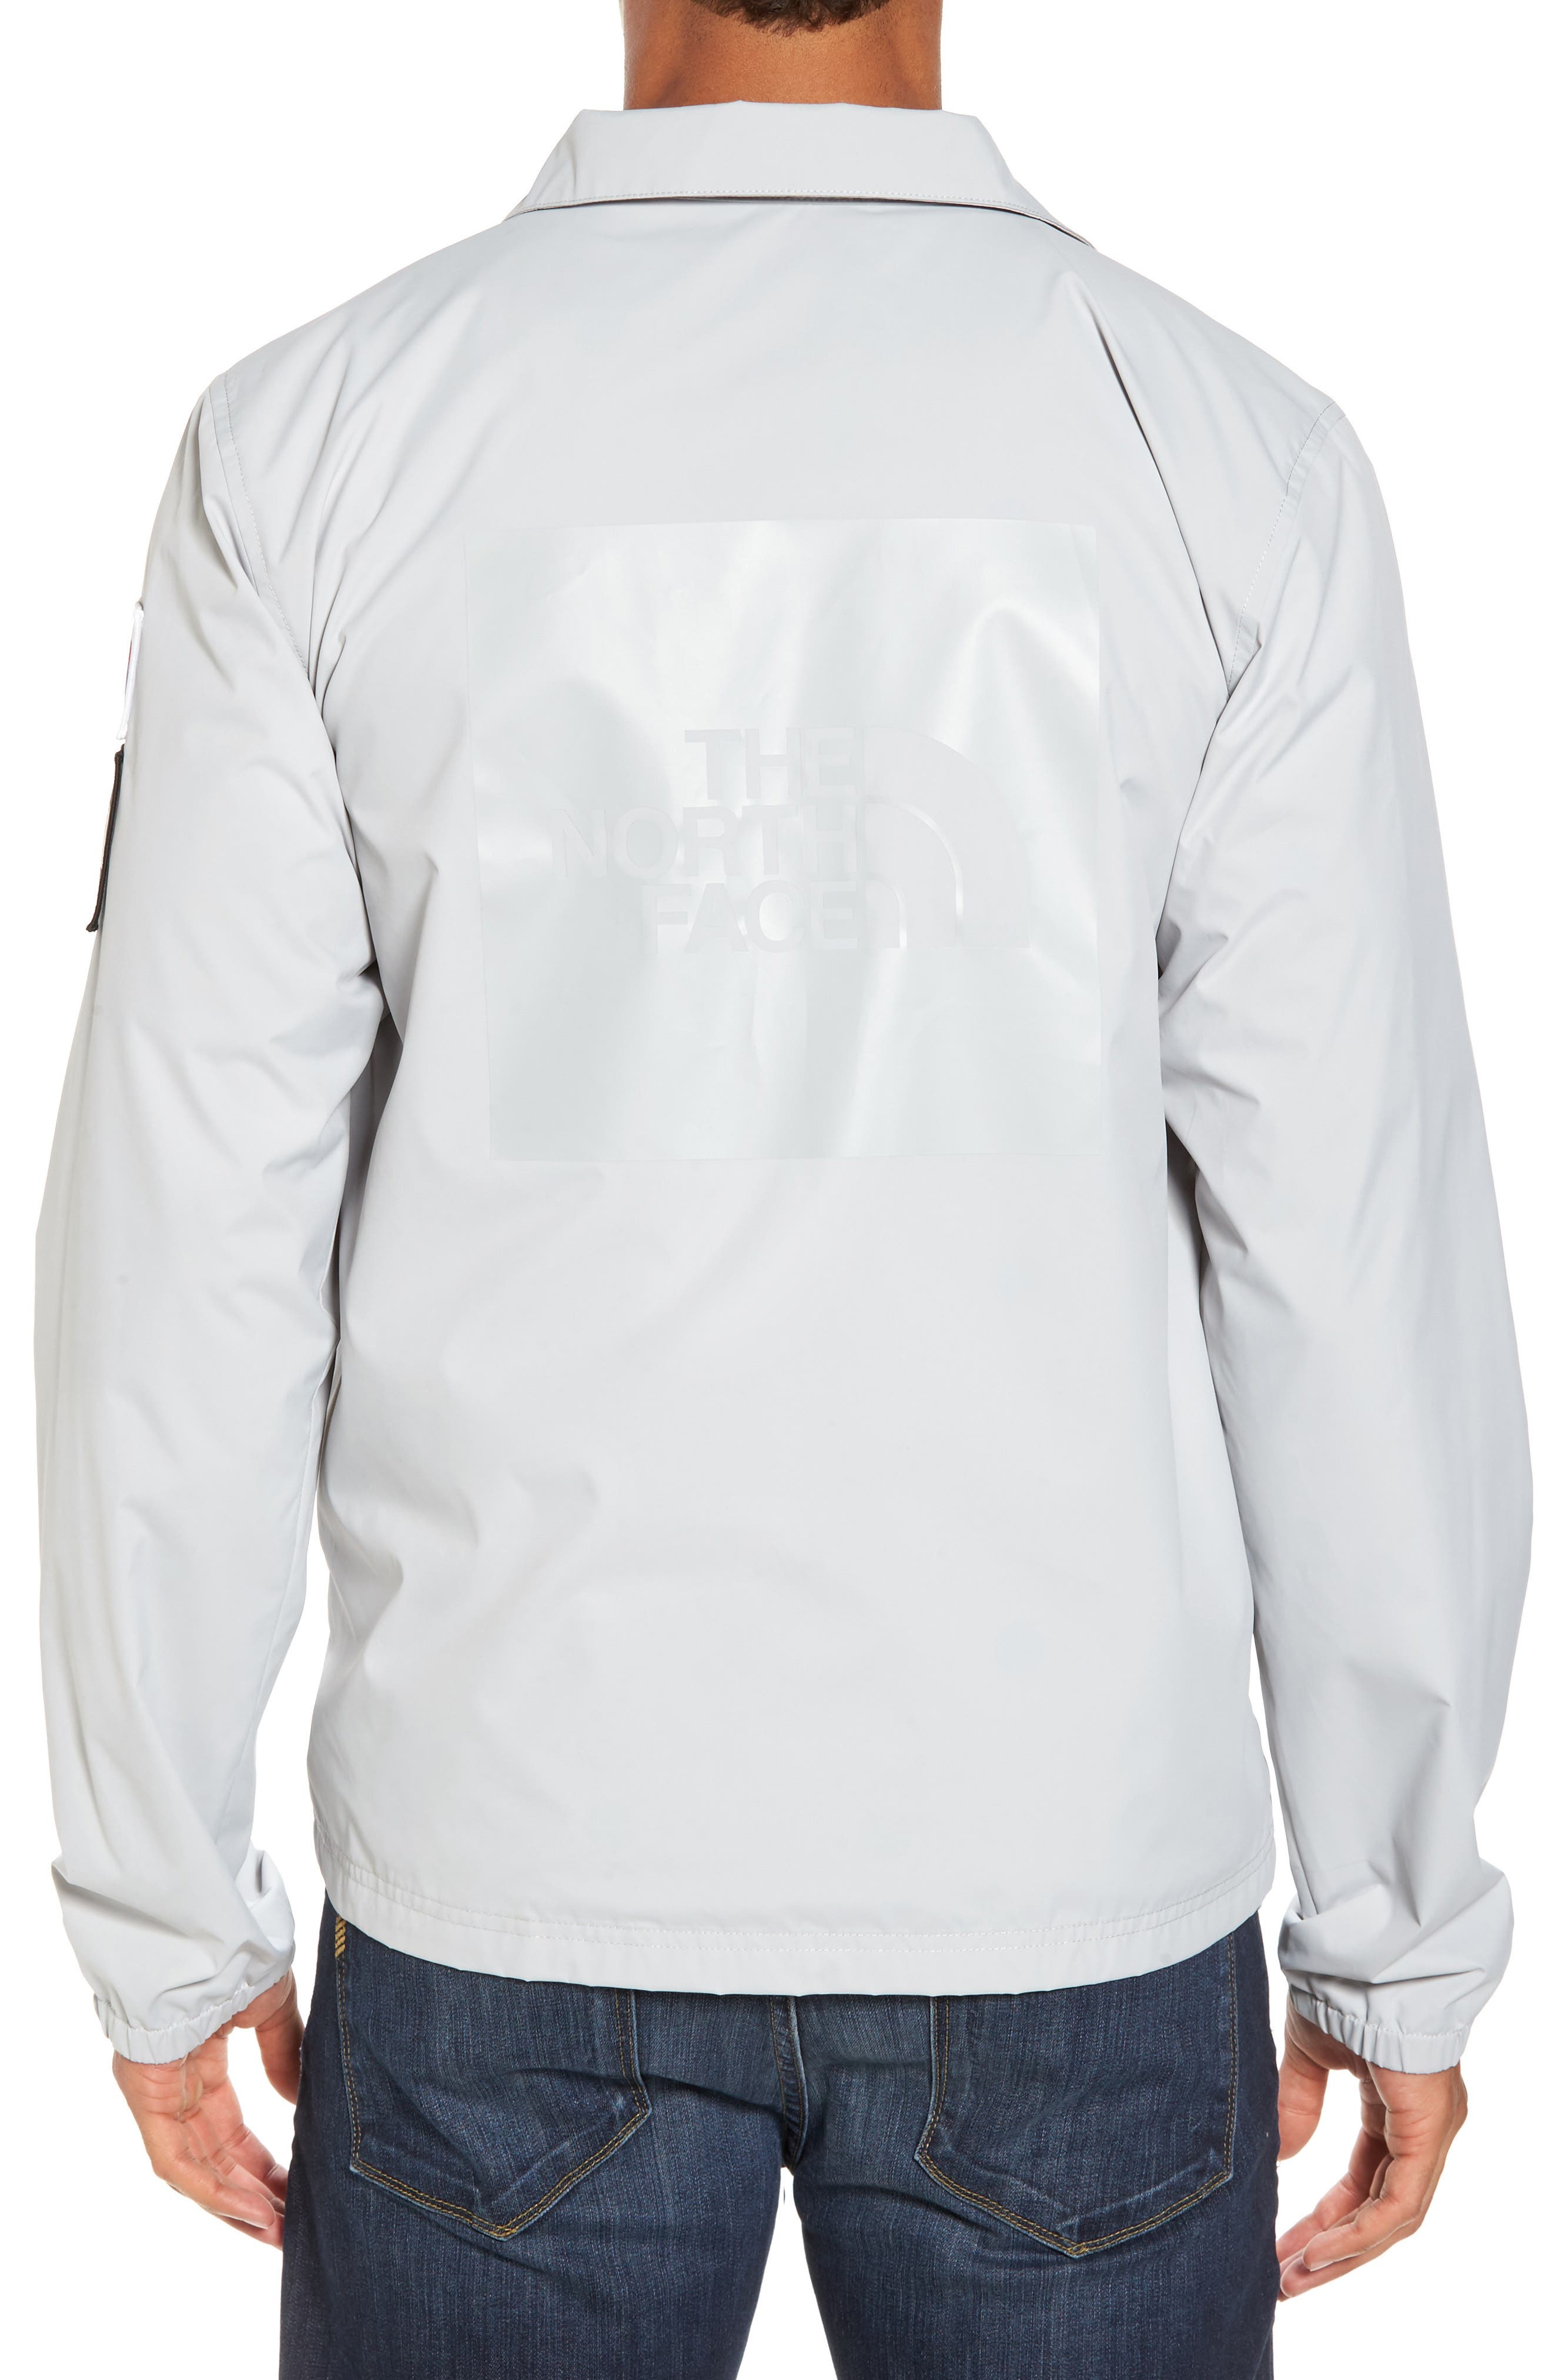 International Collection Coach Jacket,                             Alternate thumbnail 5, color,